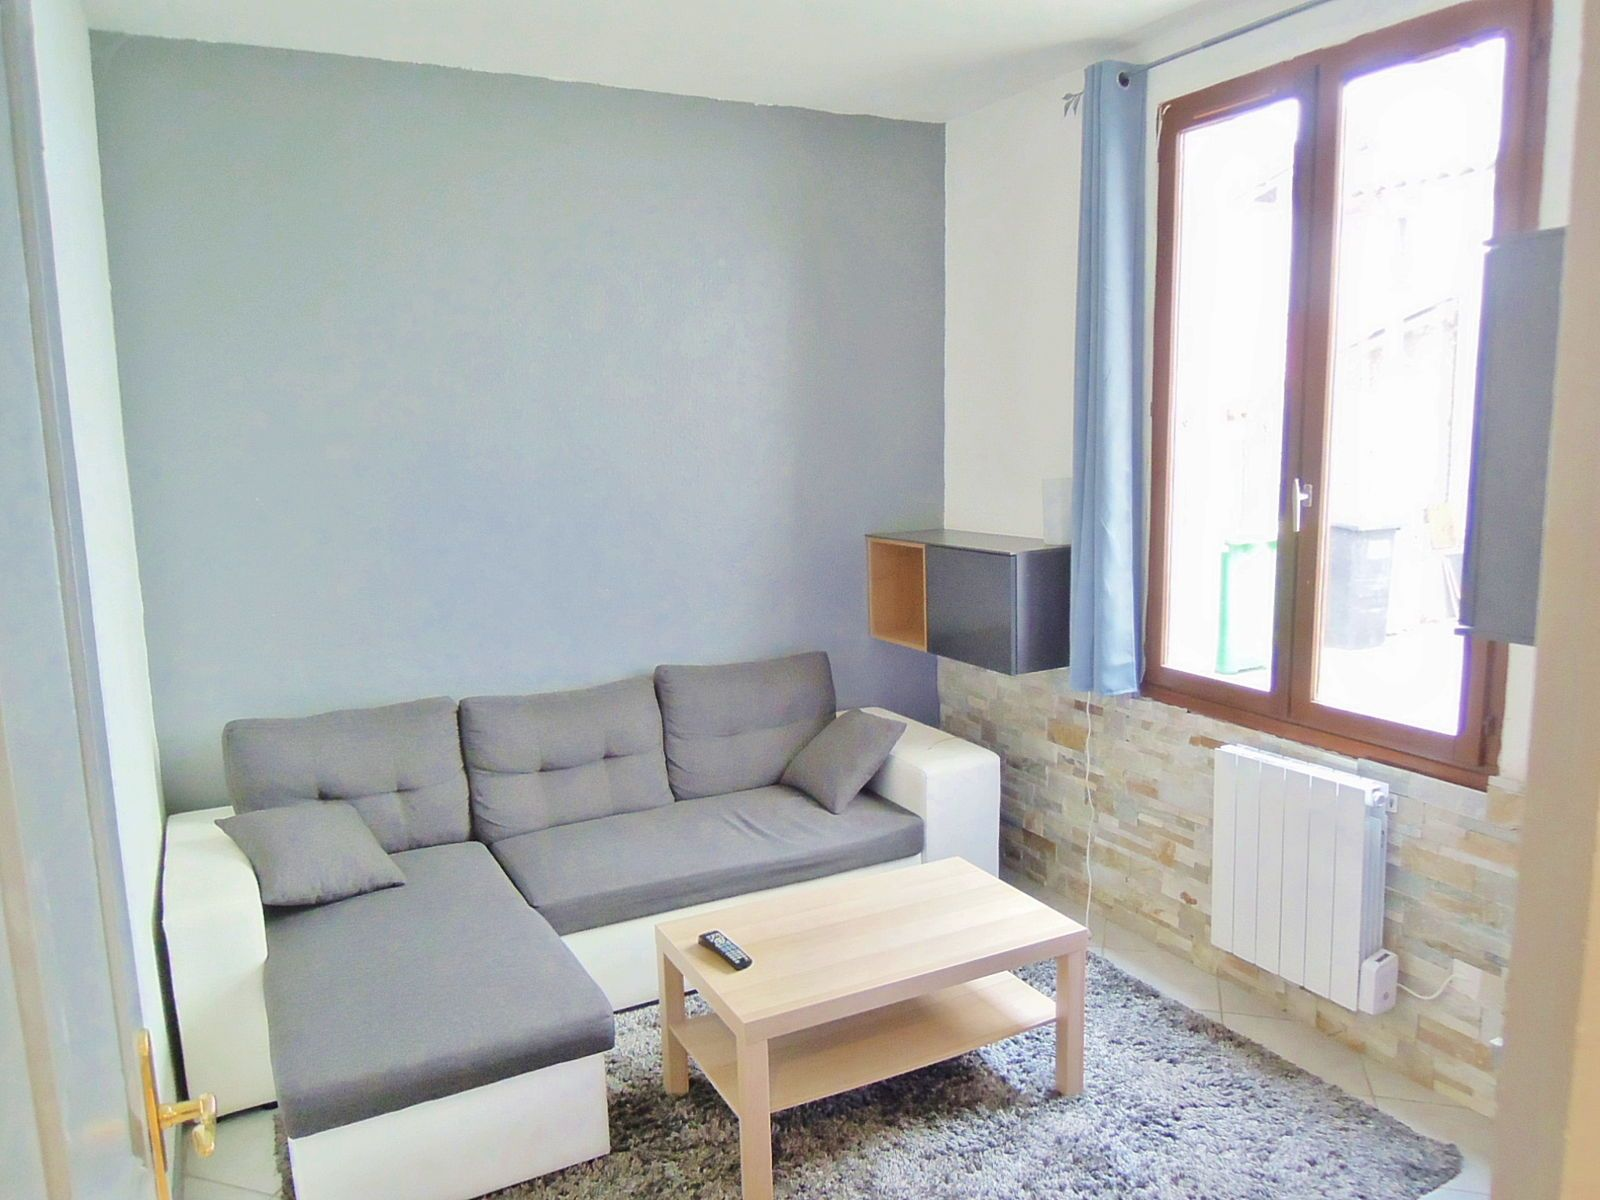 Vends appartement F2idéal colocation Grenoble Claude Genin - 40m²